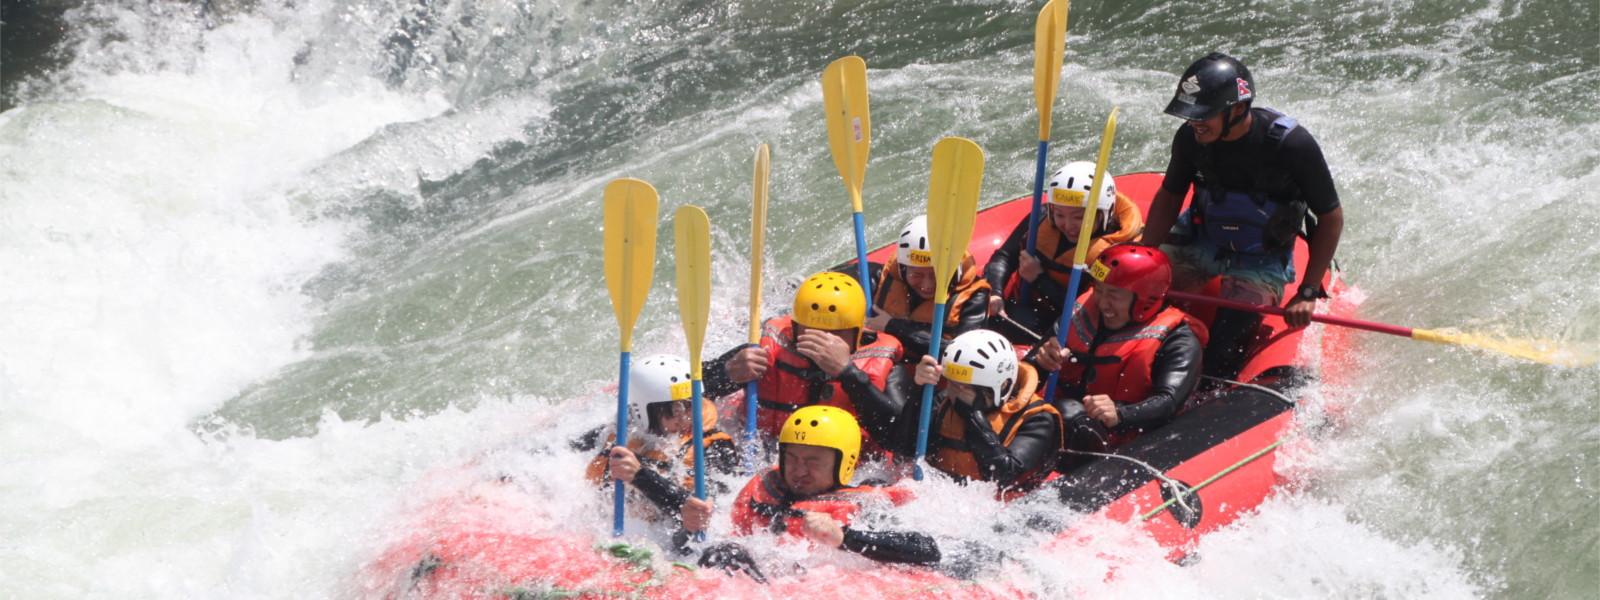 日本一の激流吉野川